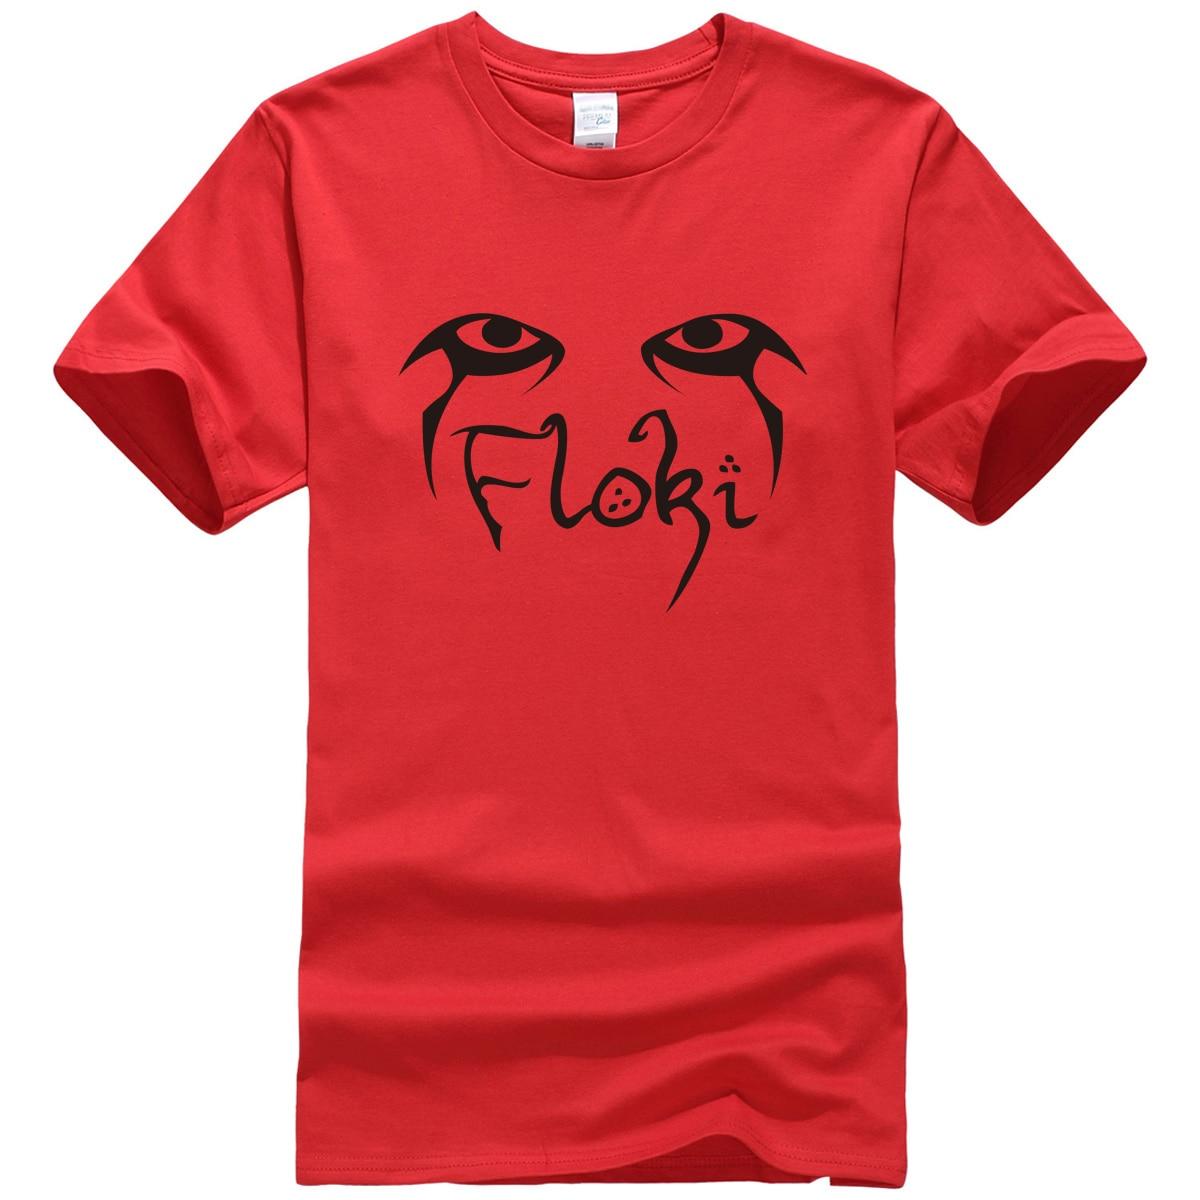 Мужская Уличная футболка VIKINGS FLOKI, хлопковая Футболка в стиле хип-хоп на весну и лето 2019